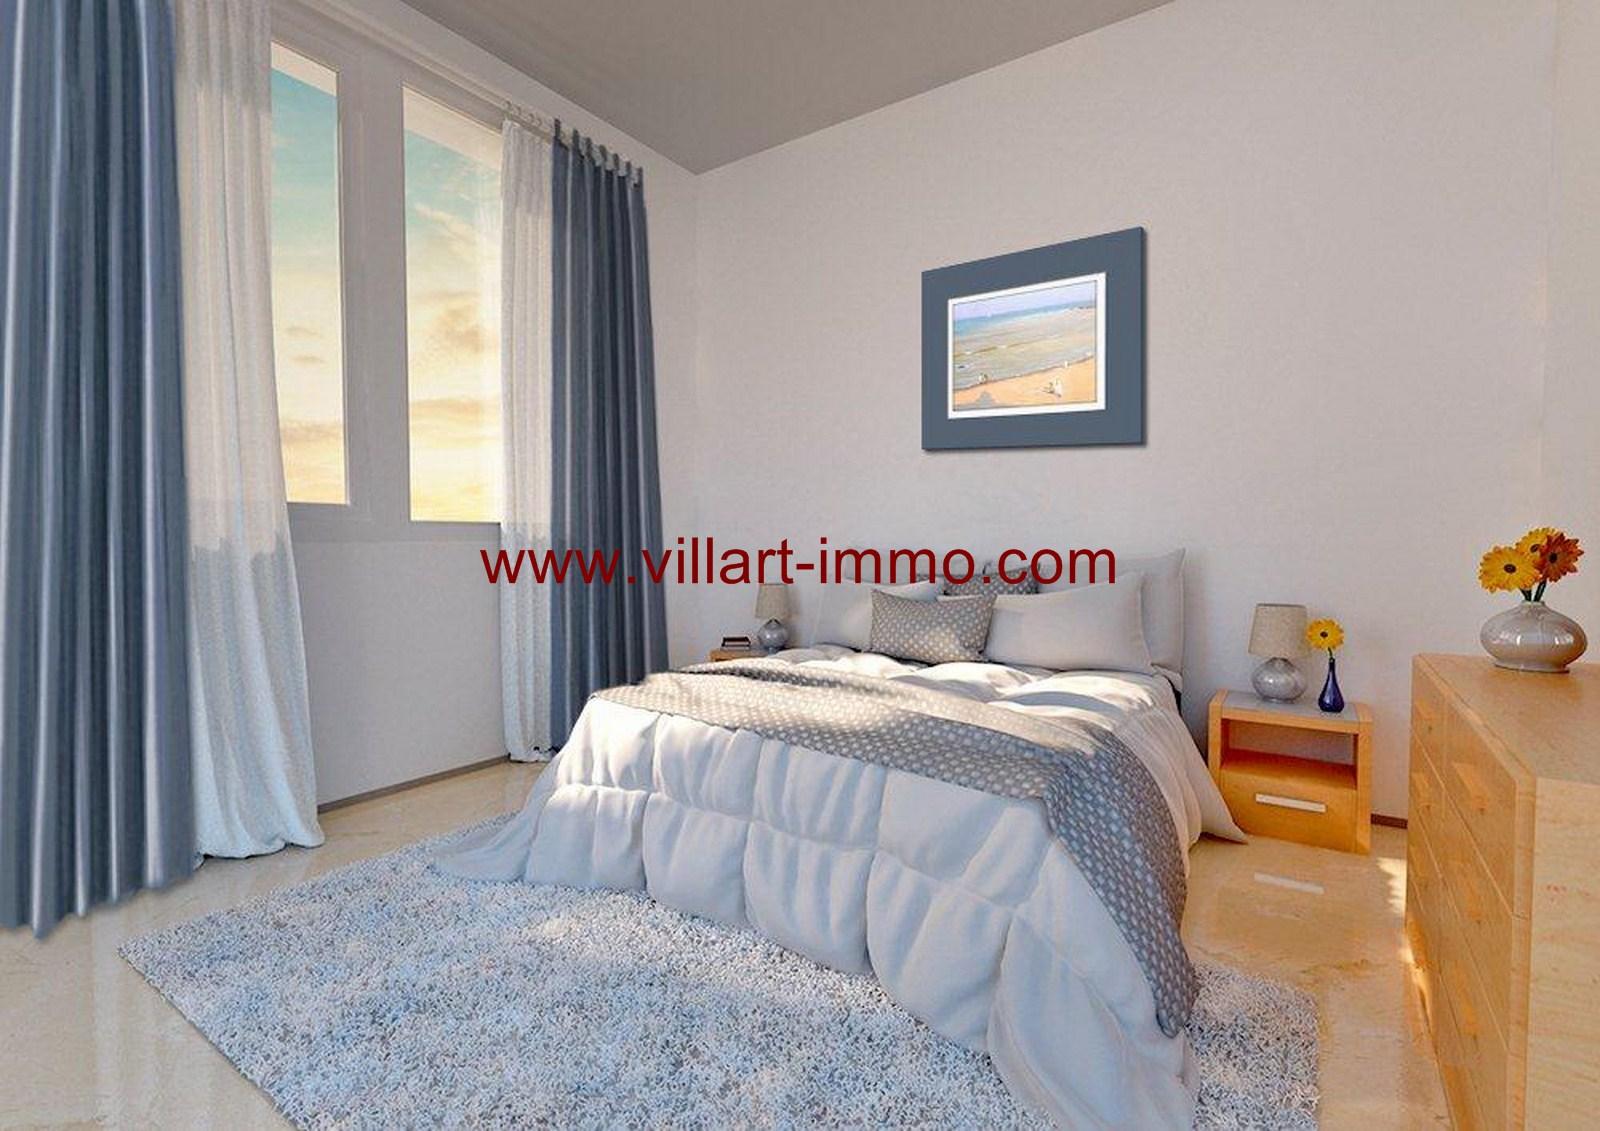 6-Vente-Appartement-Tanger-Centre-ville-SHAZ-Villart Immo